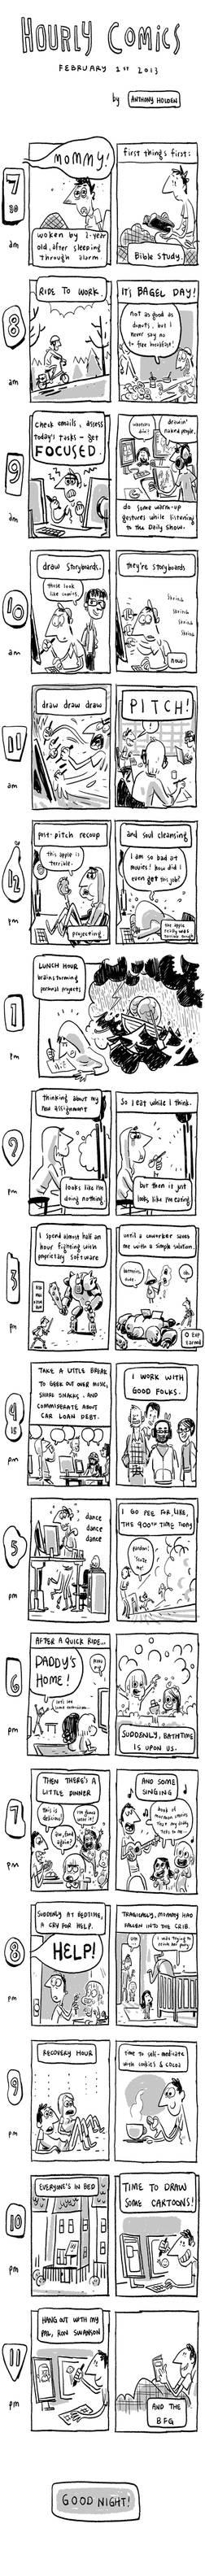 Hourly Comics Day!